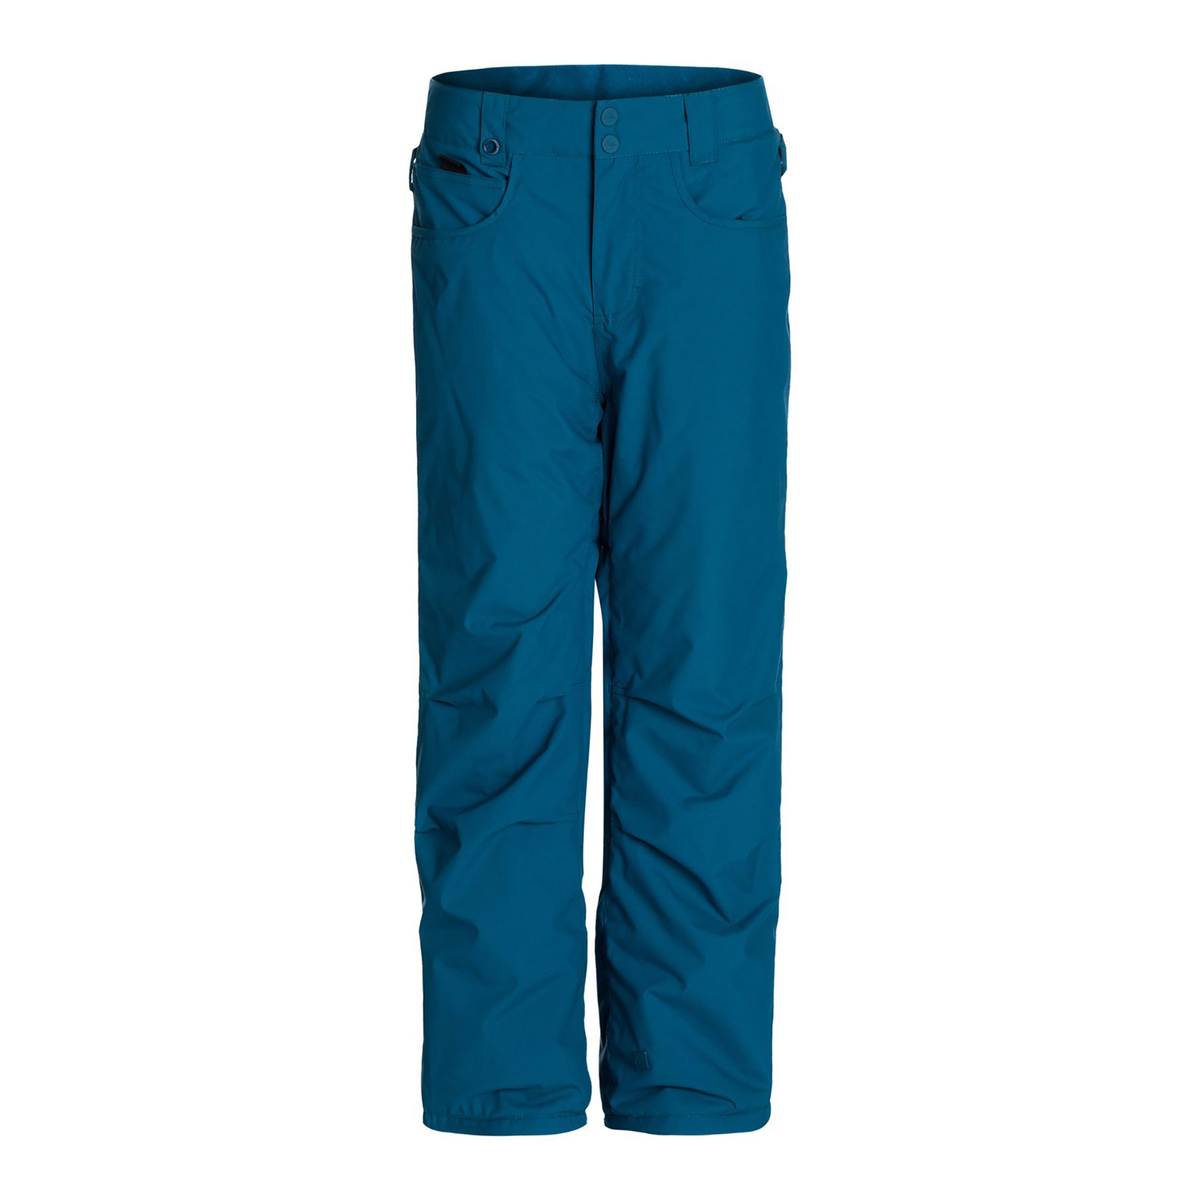 Prezzi Quiksilver Pantalone state bambino